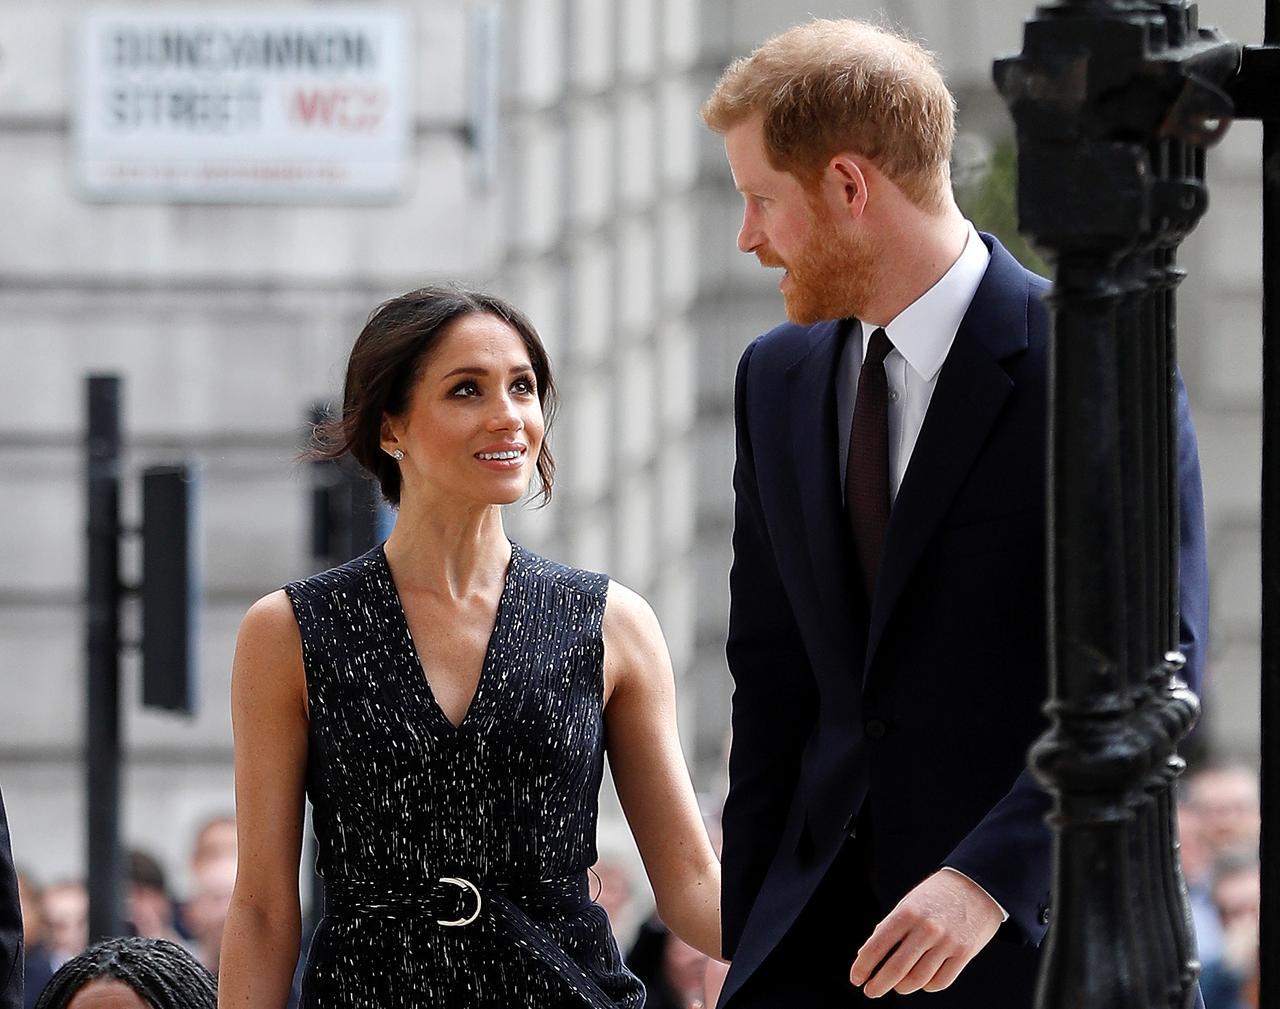 Megan And Harry Wedding.Harry Meghan And Megan To Crew British Airways Royal Wedding Flight